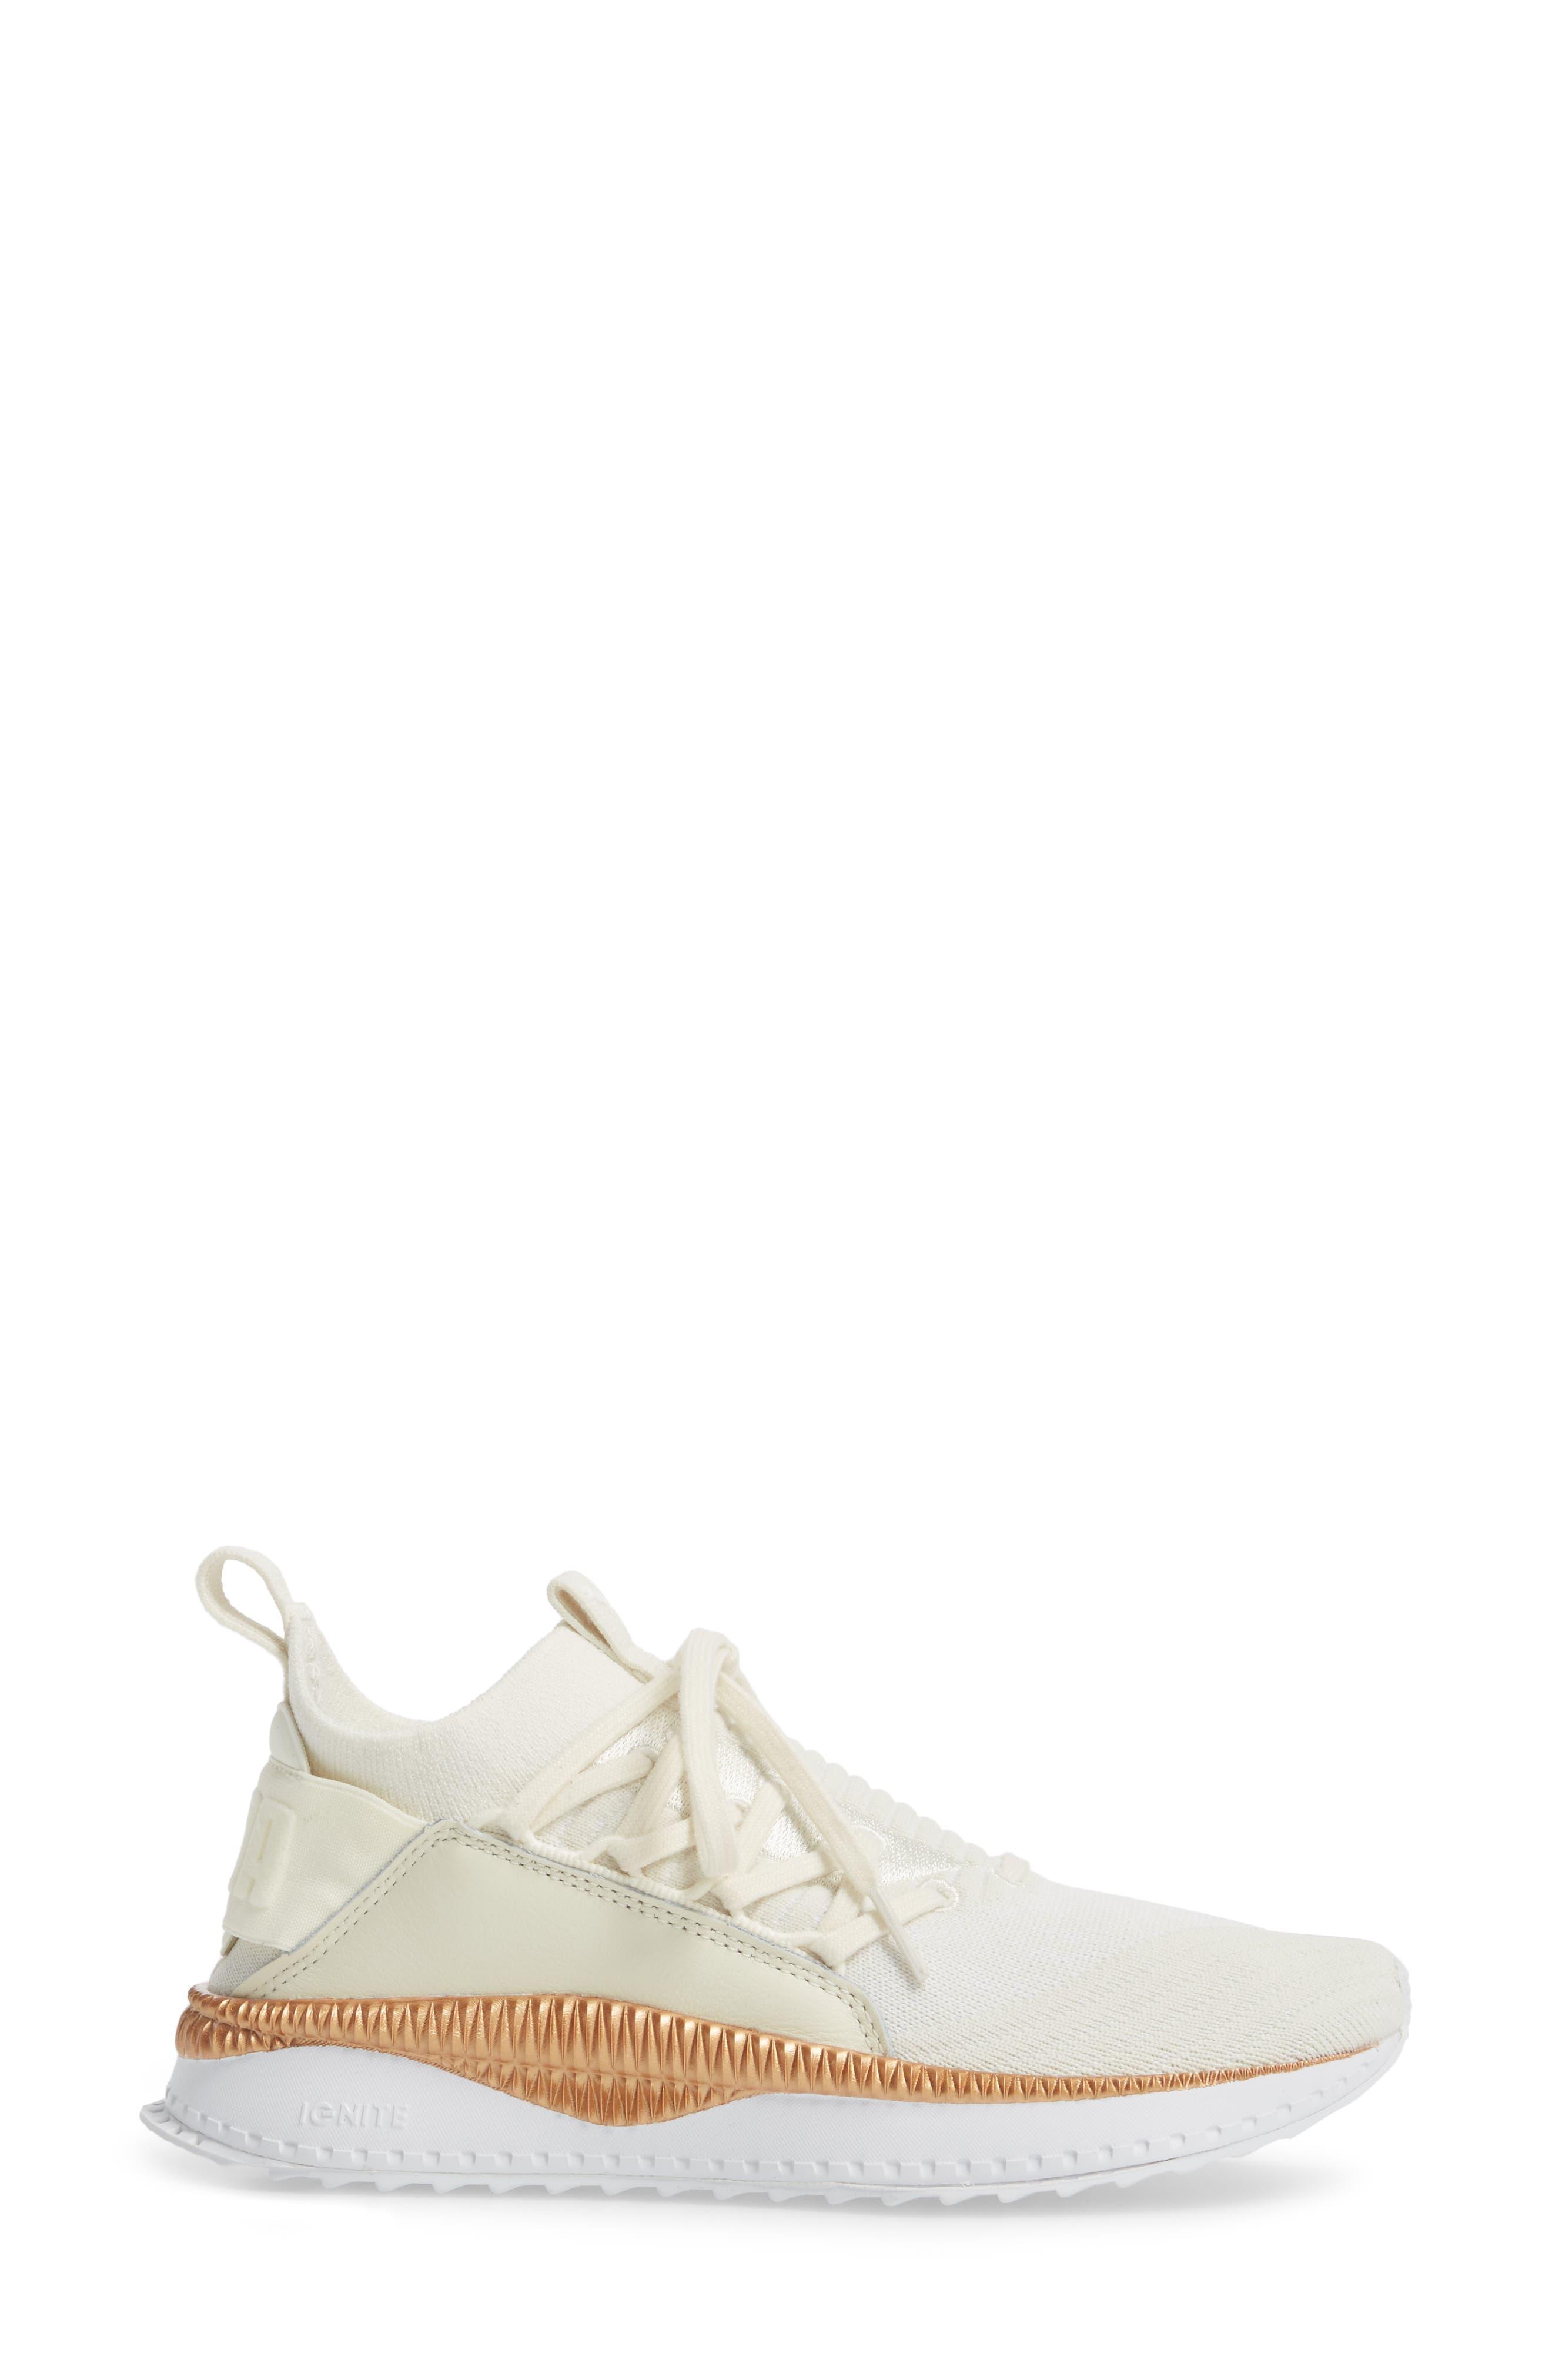 Tsugi Jun Knit Sneaker,                             Alternate thumbnail 19, color,